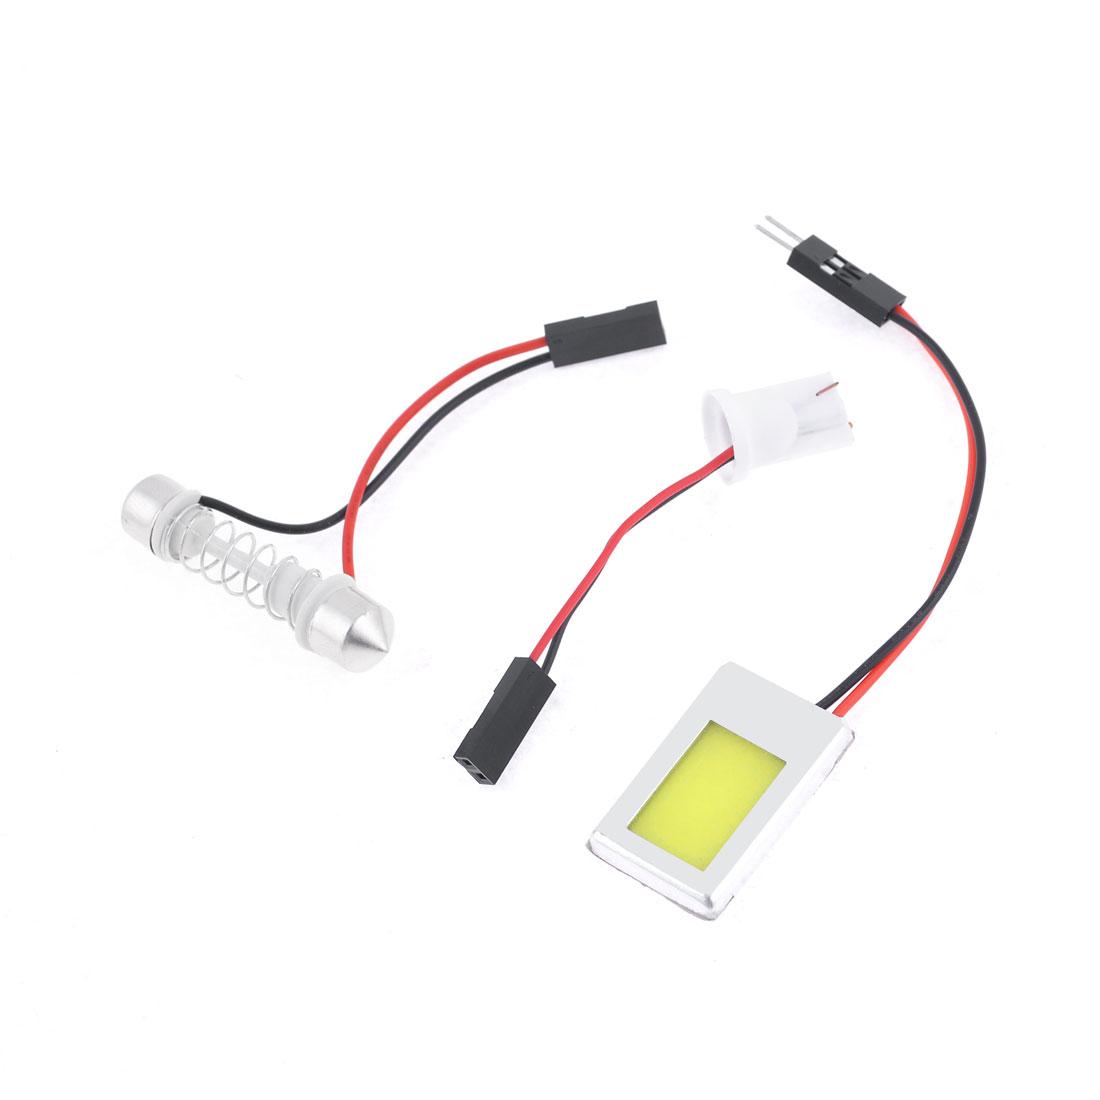 Auto White COB Dome Light Lamp w T10 Festoon Adapter